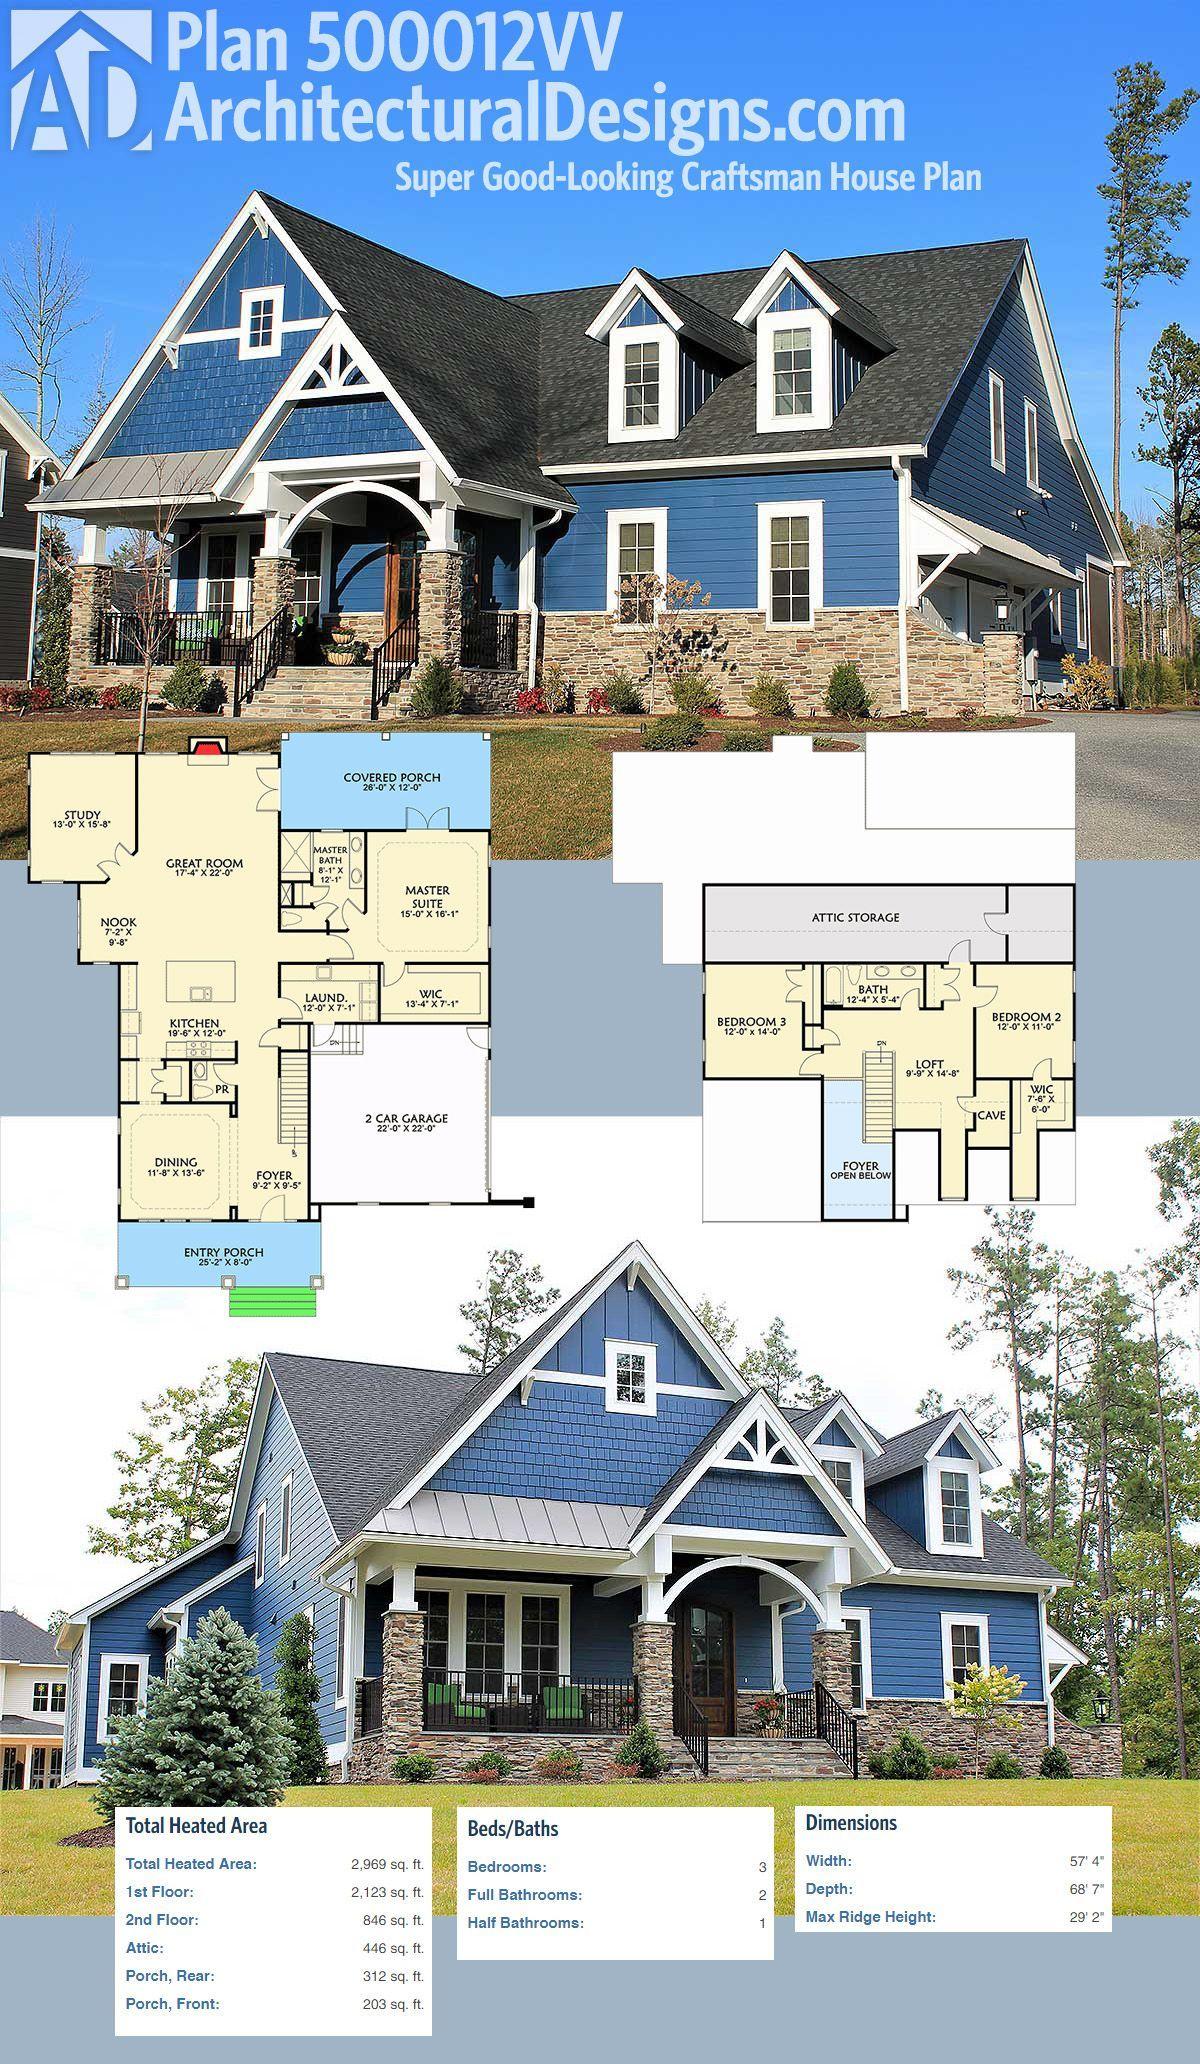 Architectural Designs Super Good Looking Craftsman House Plan